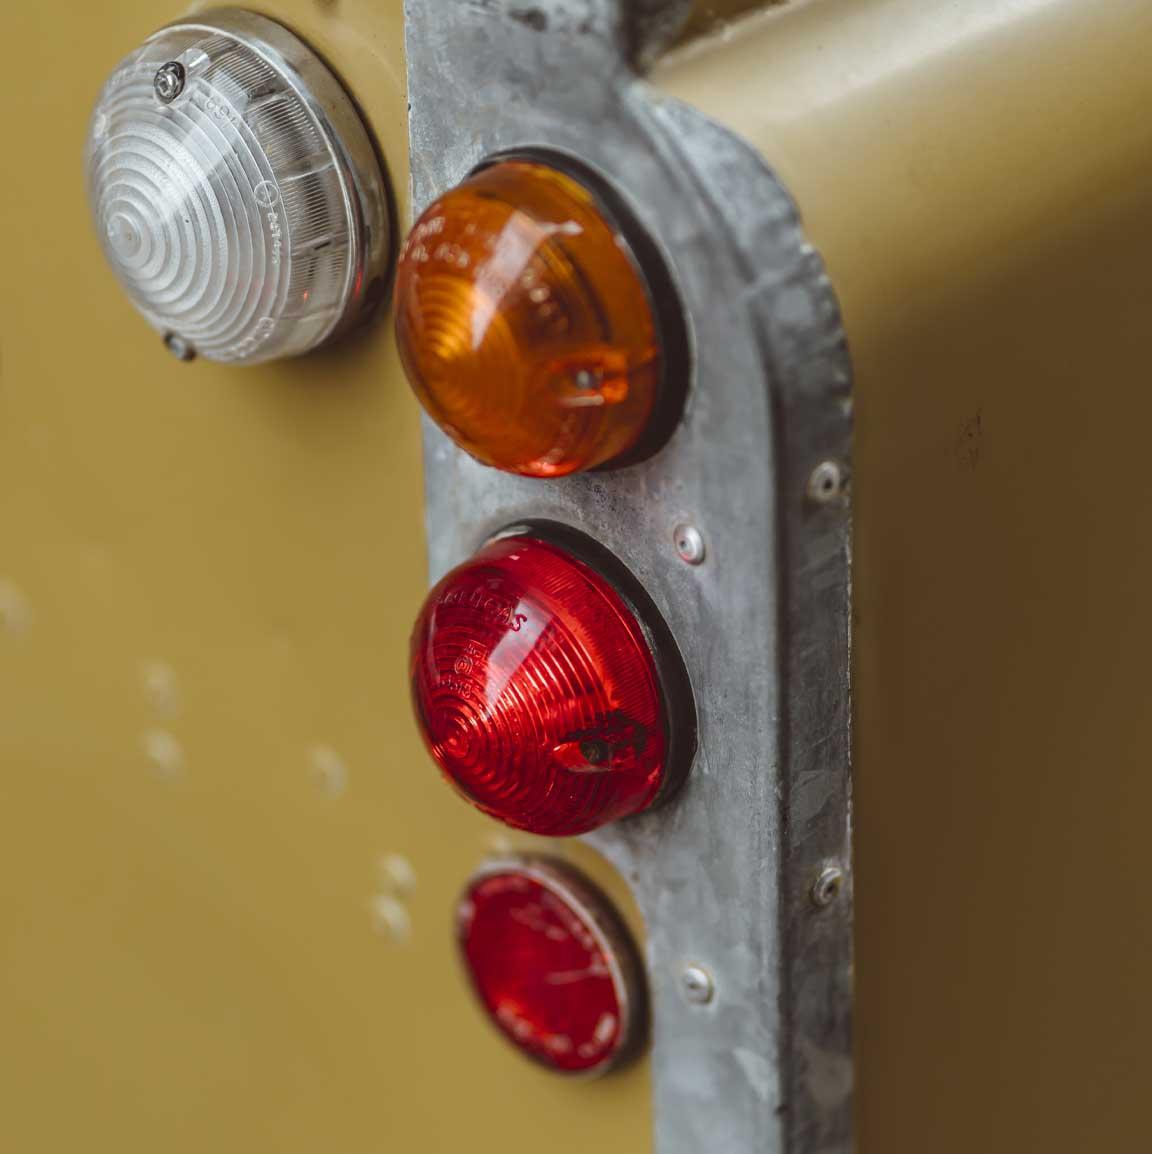 1975_Land_Rover_Series_III_109_Bahama_Gold_Small_0014_Layer 56.jpg